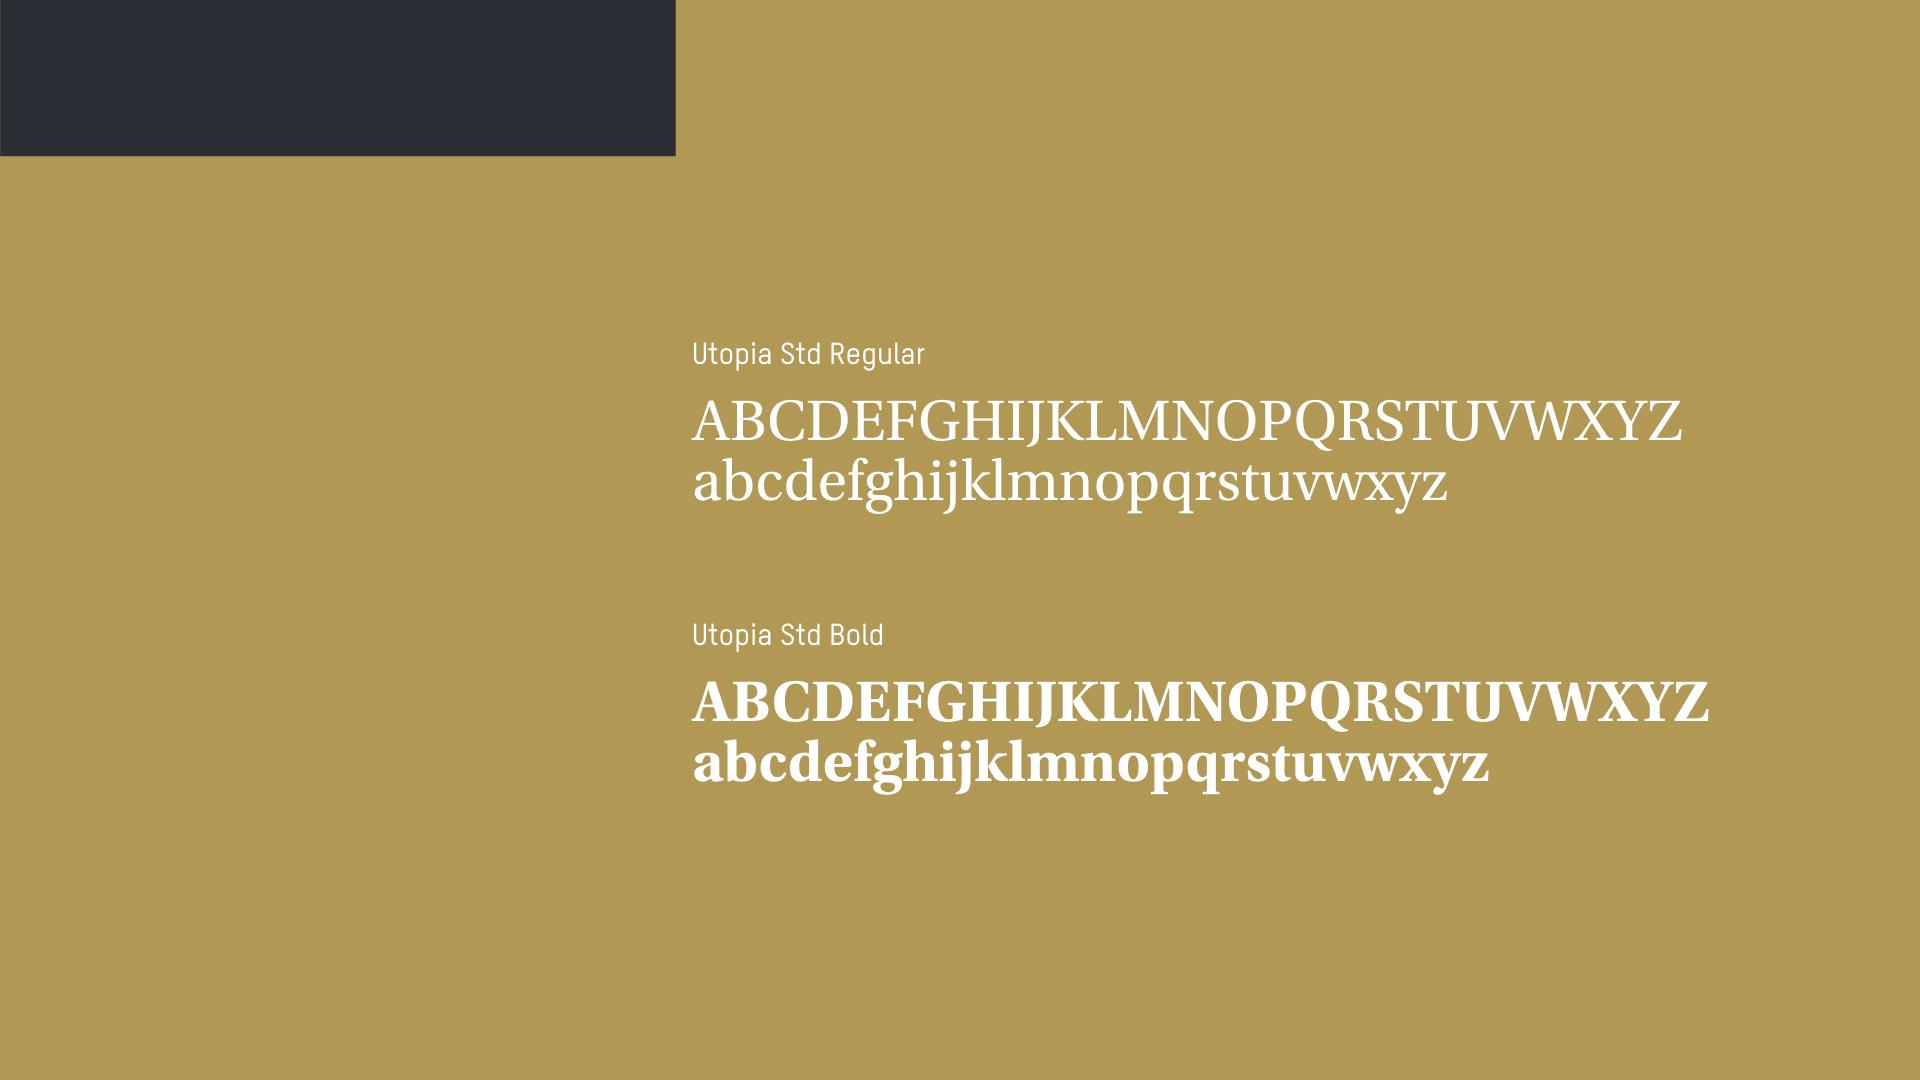 Herrenhäuser Brauerei Typografie